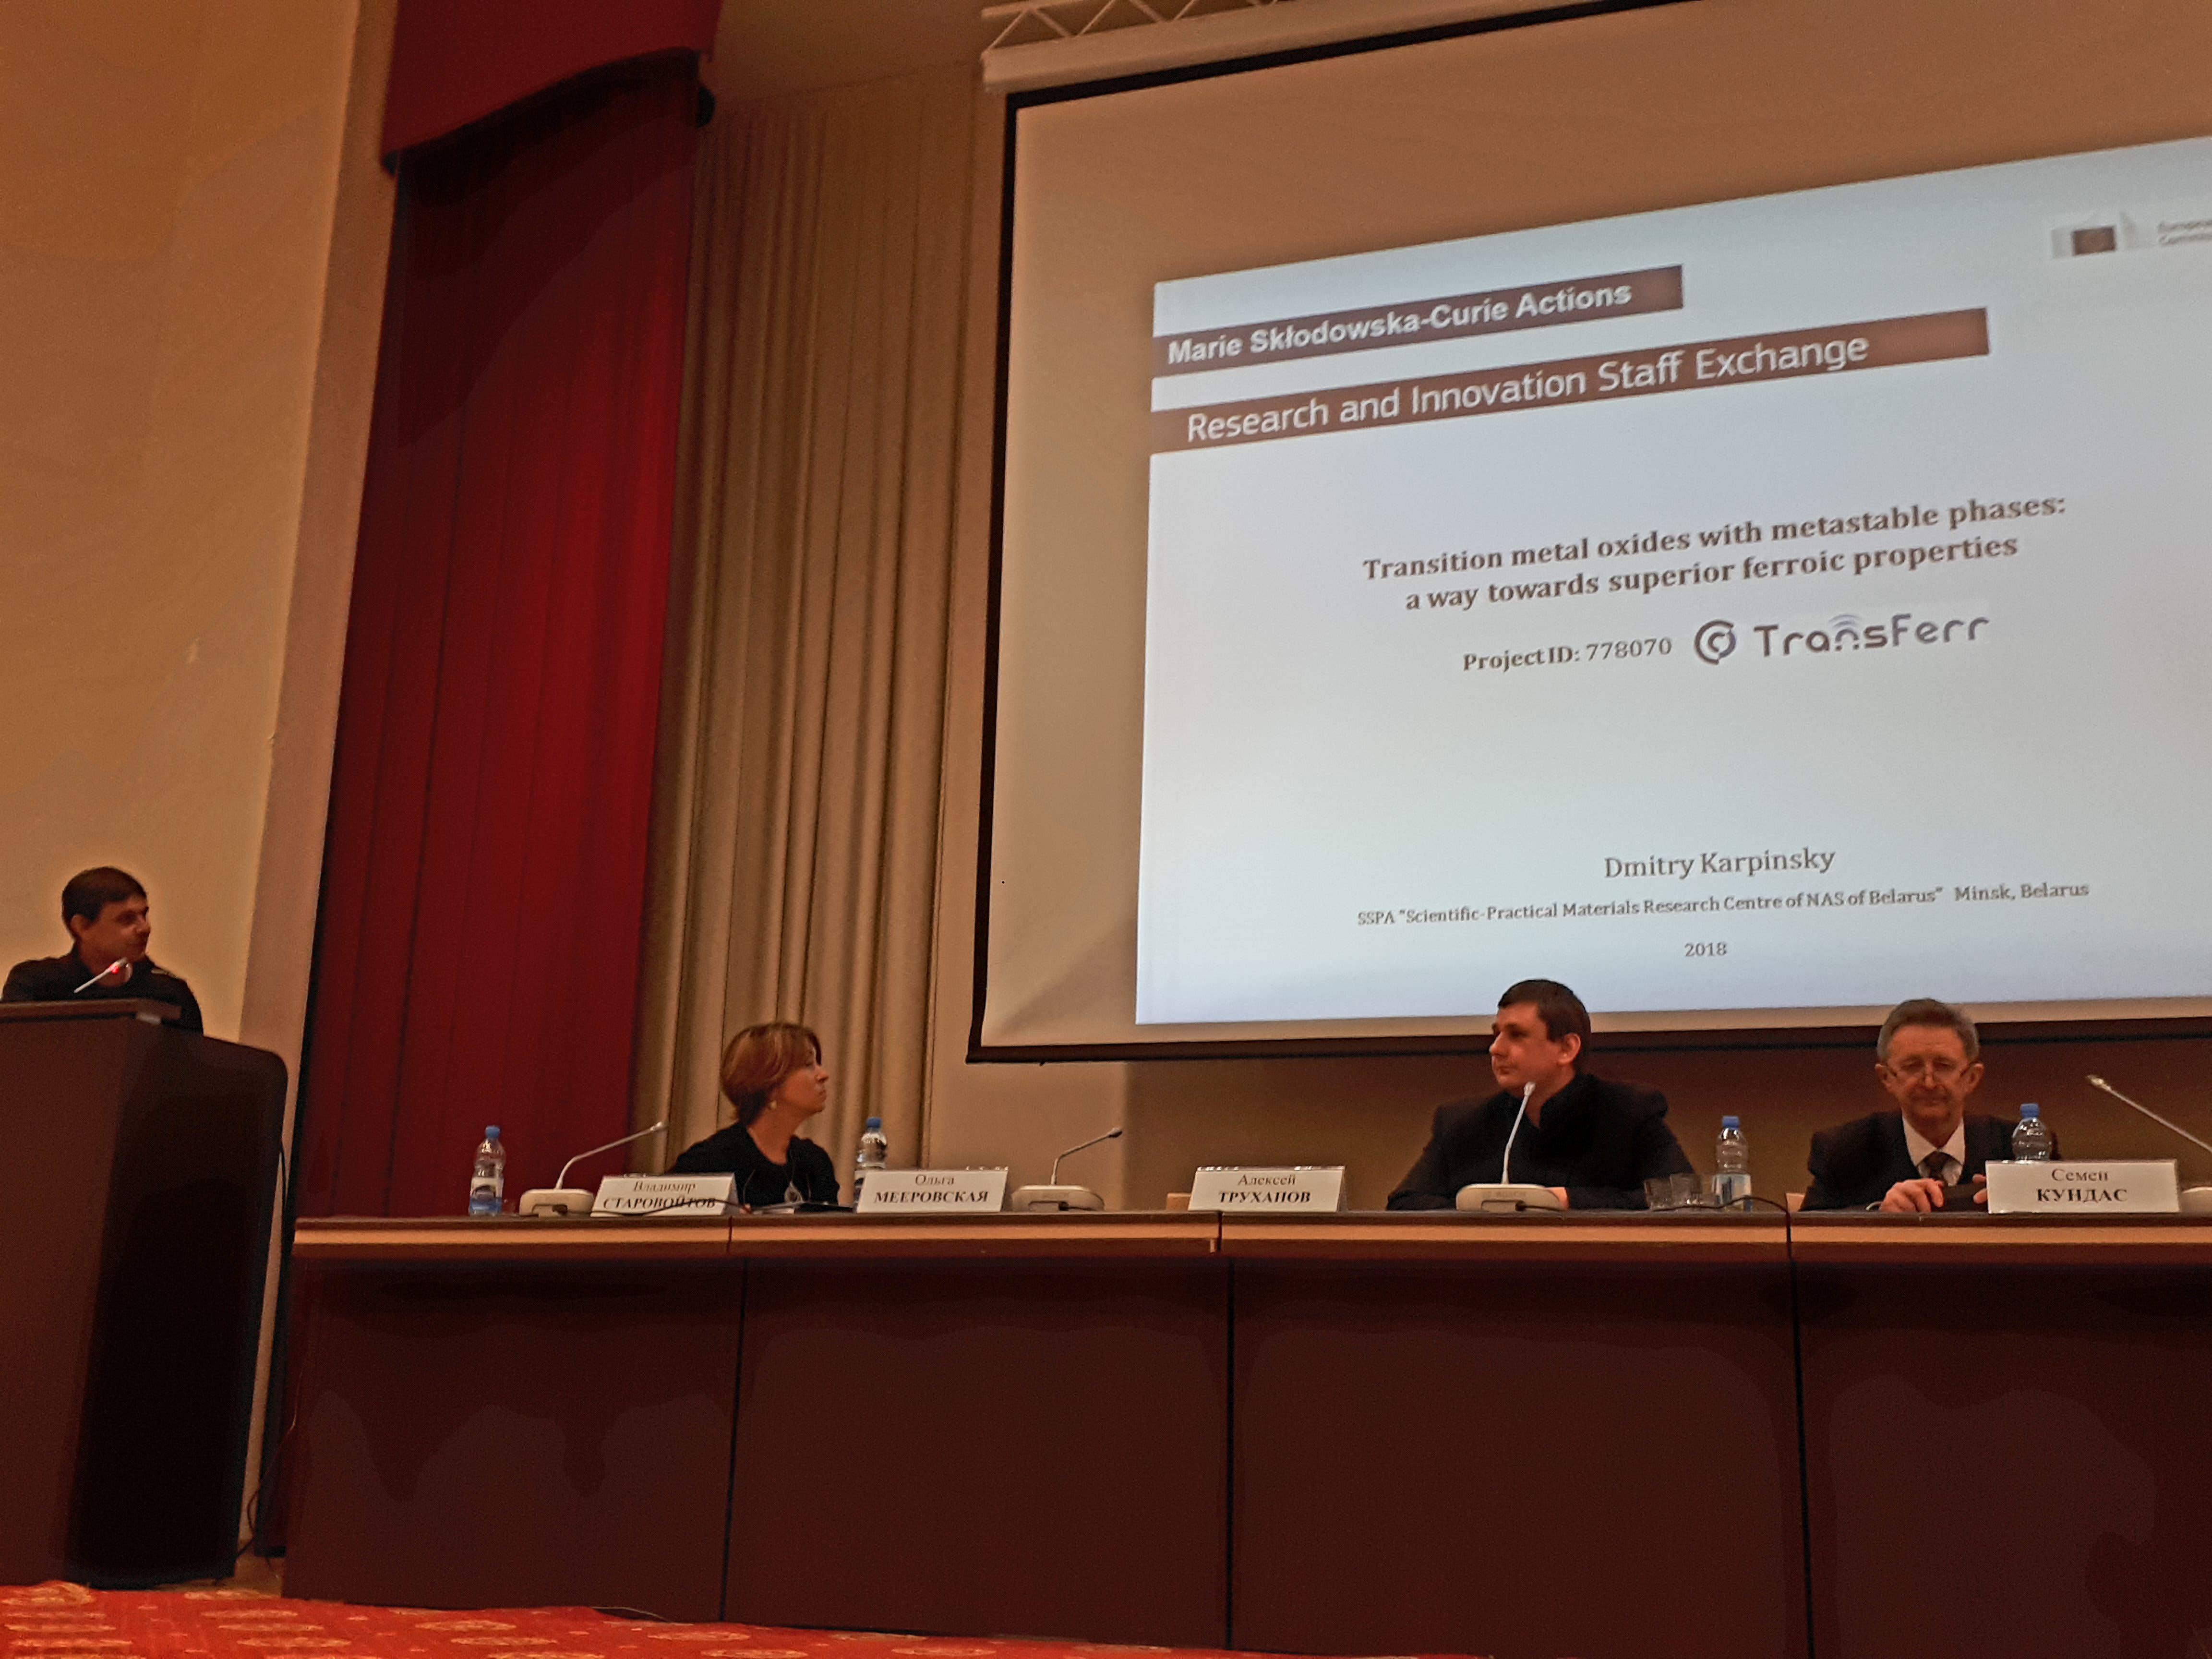 MSCA-Infoday-Minsk 2018